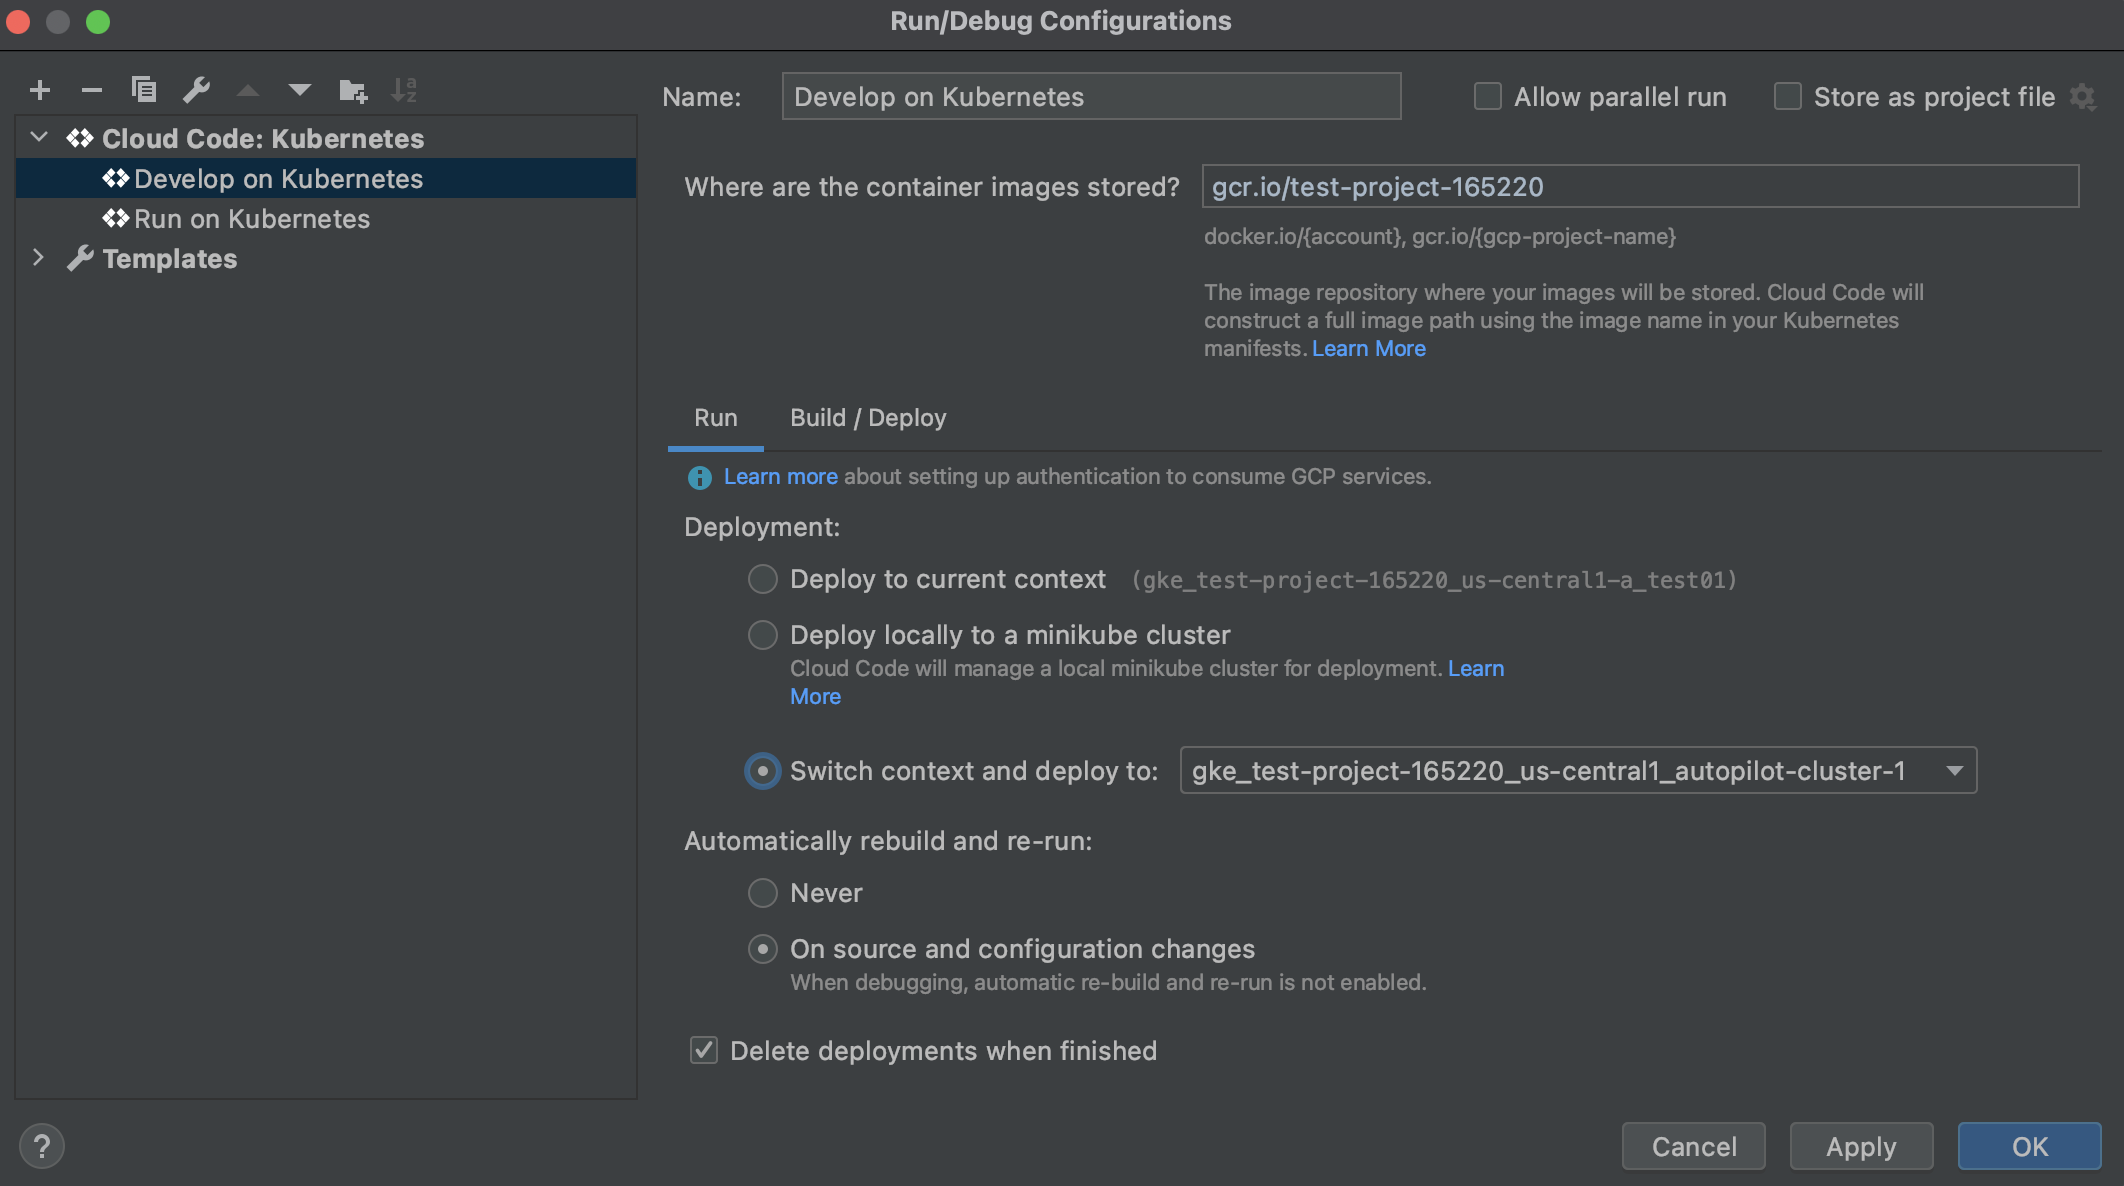 在 Cloud Code Kubernetes 配置中选择 Kubernetes 部署环境